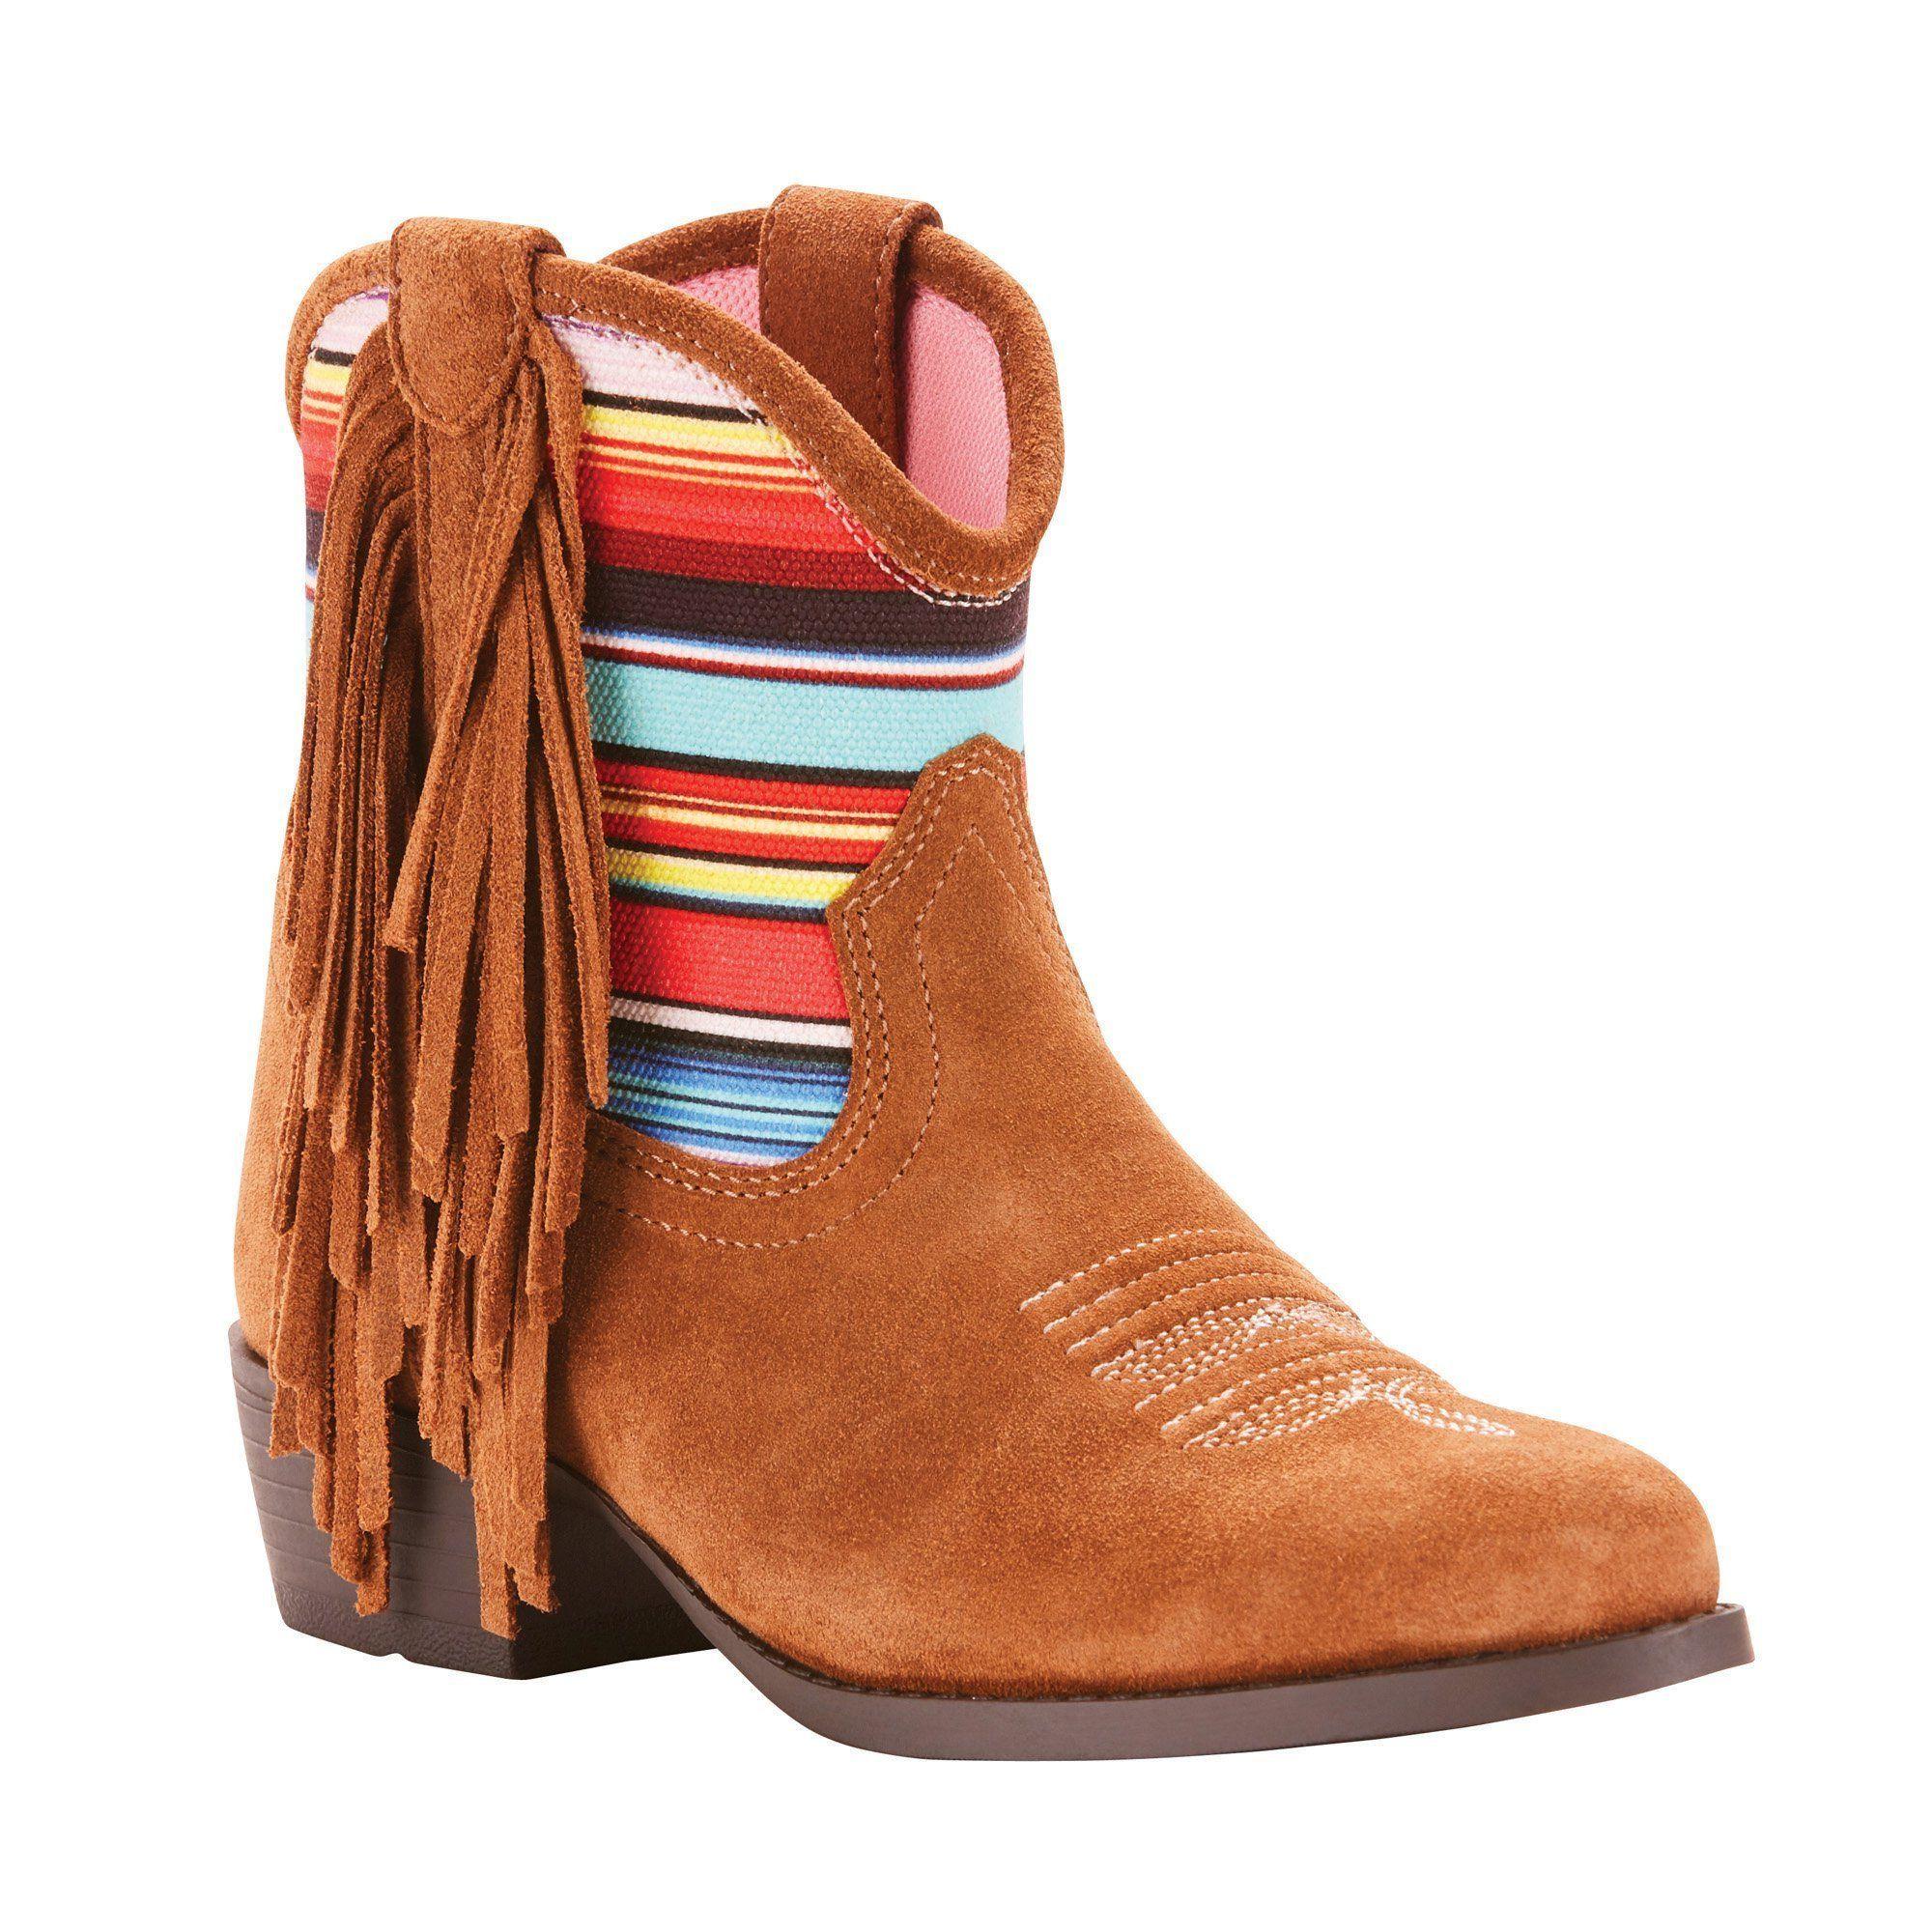 Ariat, leather, fringe Crazy Horse